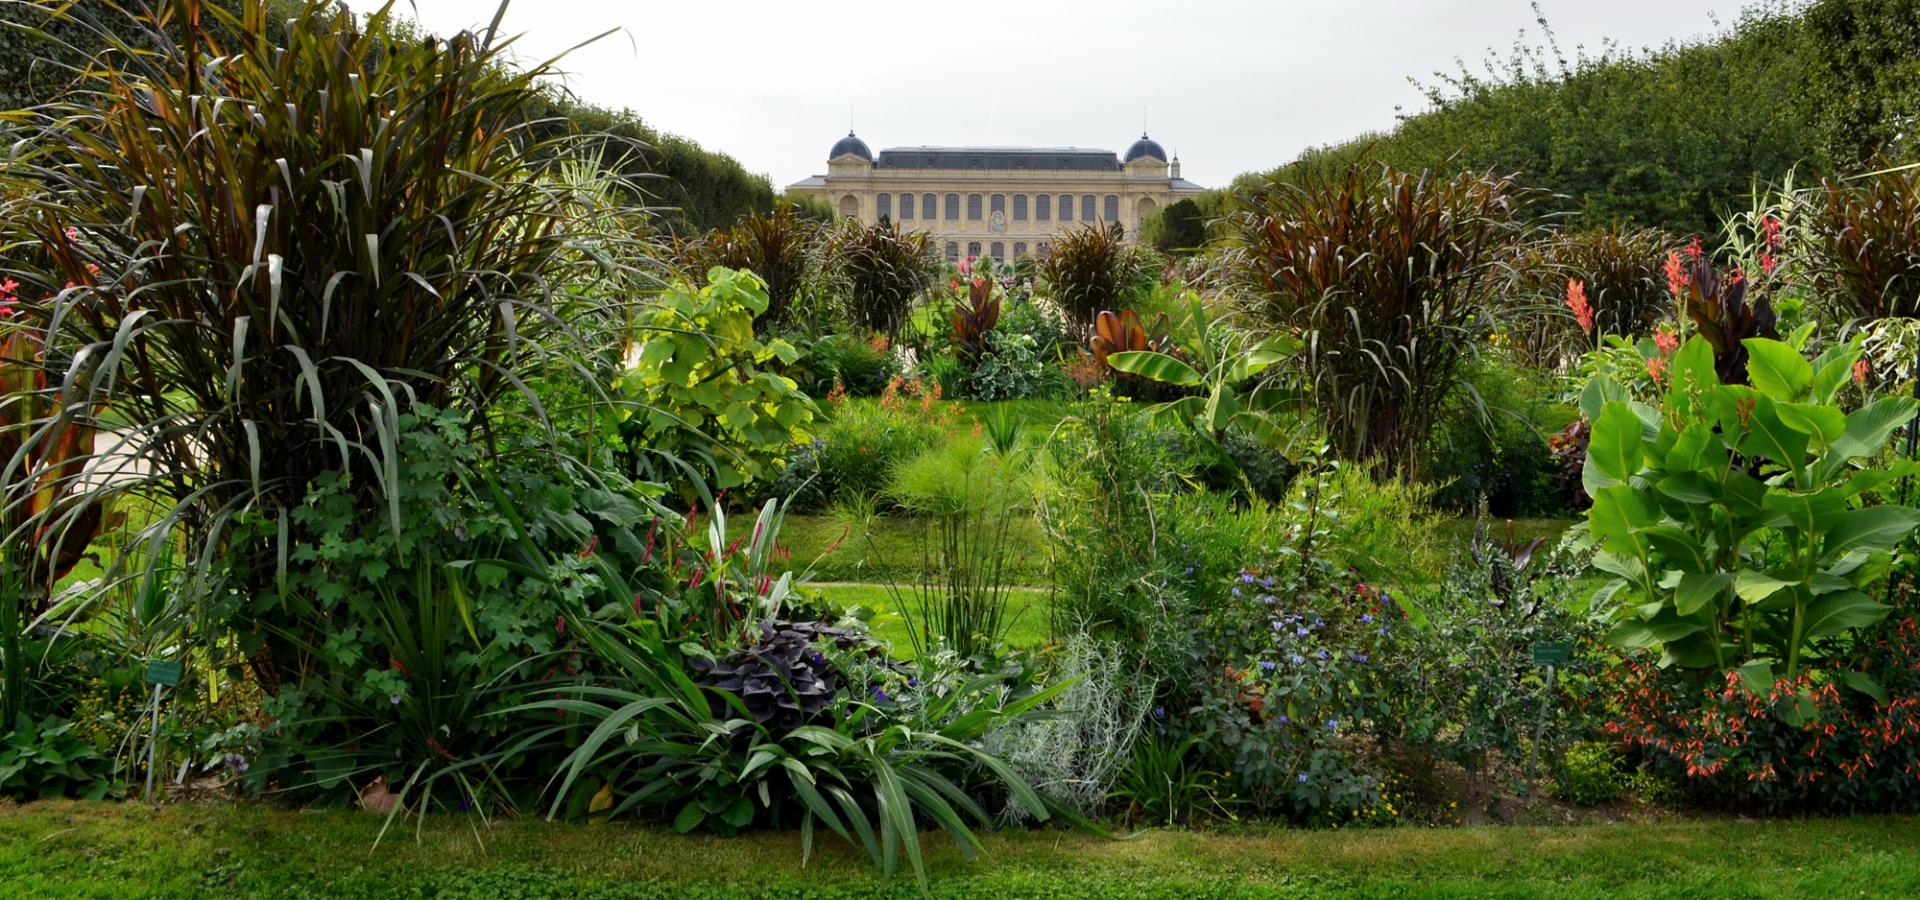 Jardin Des Plantes Galeries Jardins Zoo Du Jardin Des Plantes